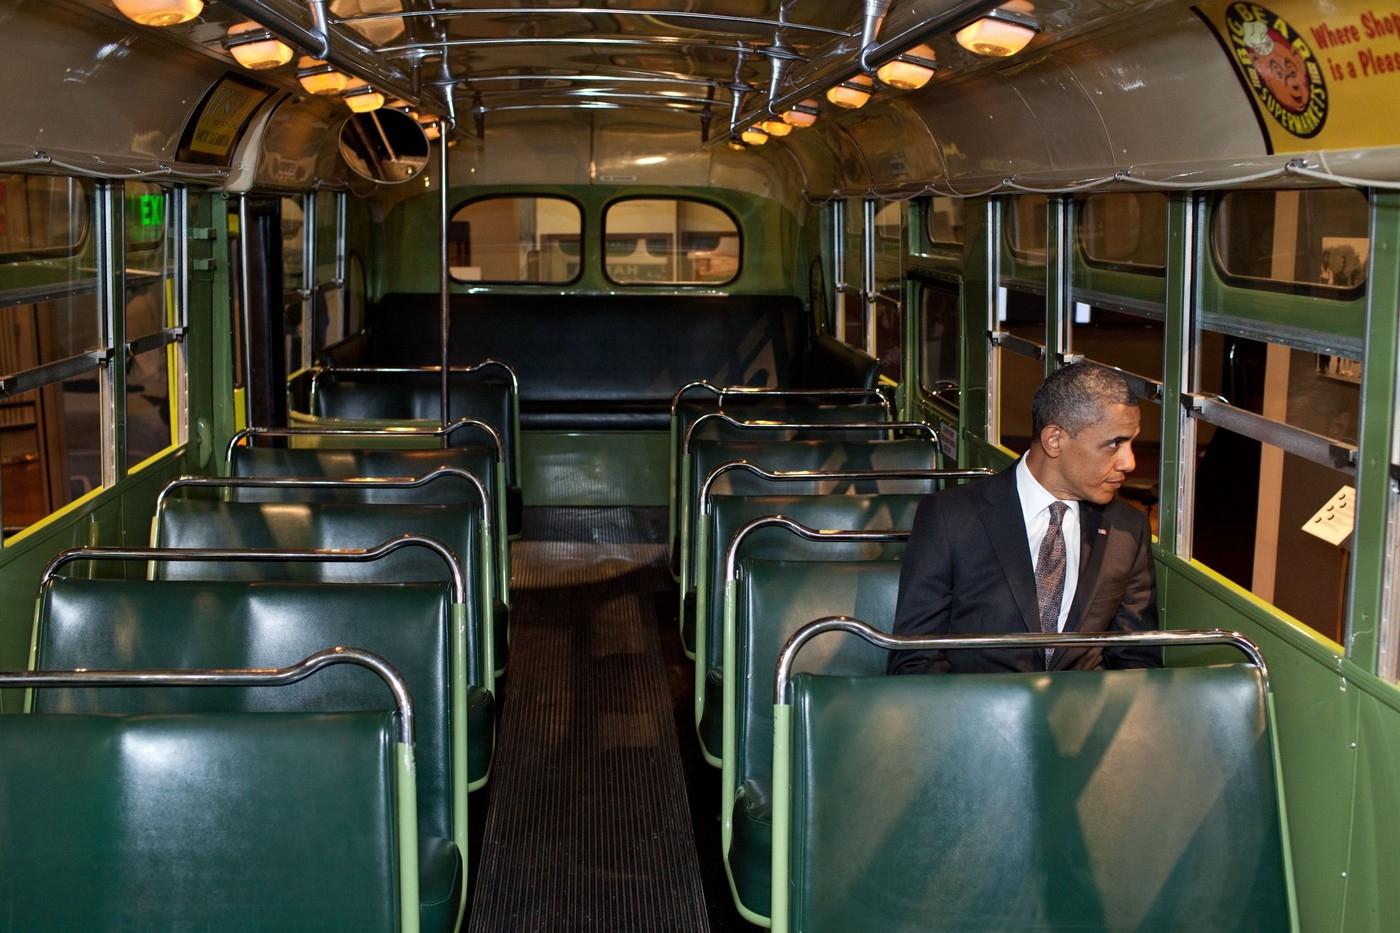 Obana - Rosa Parks